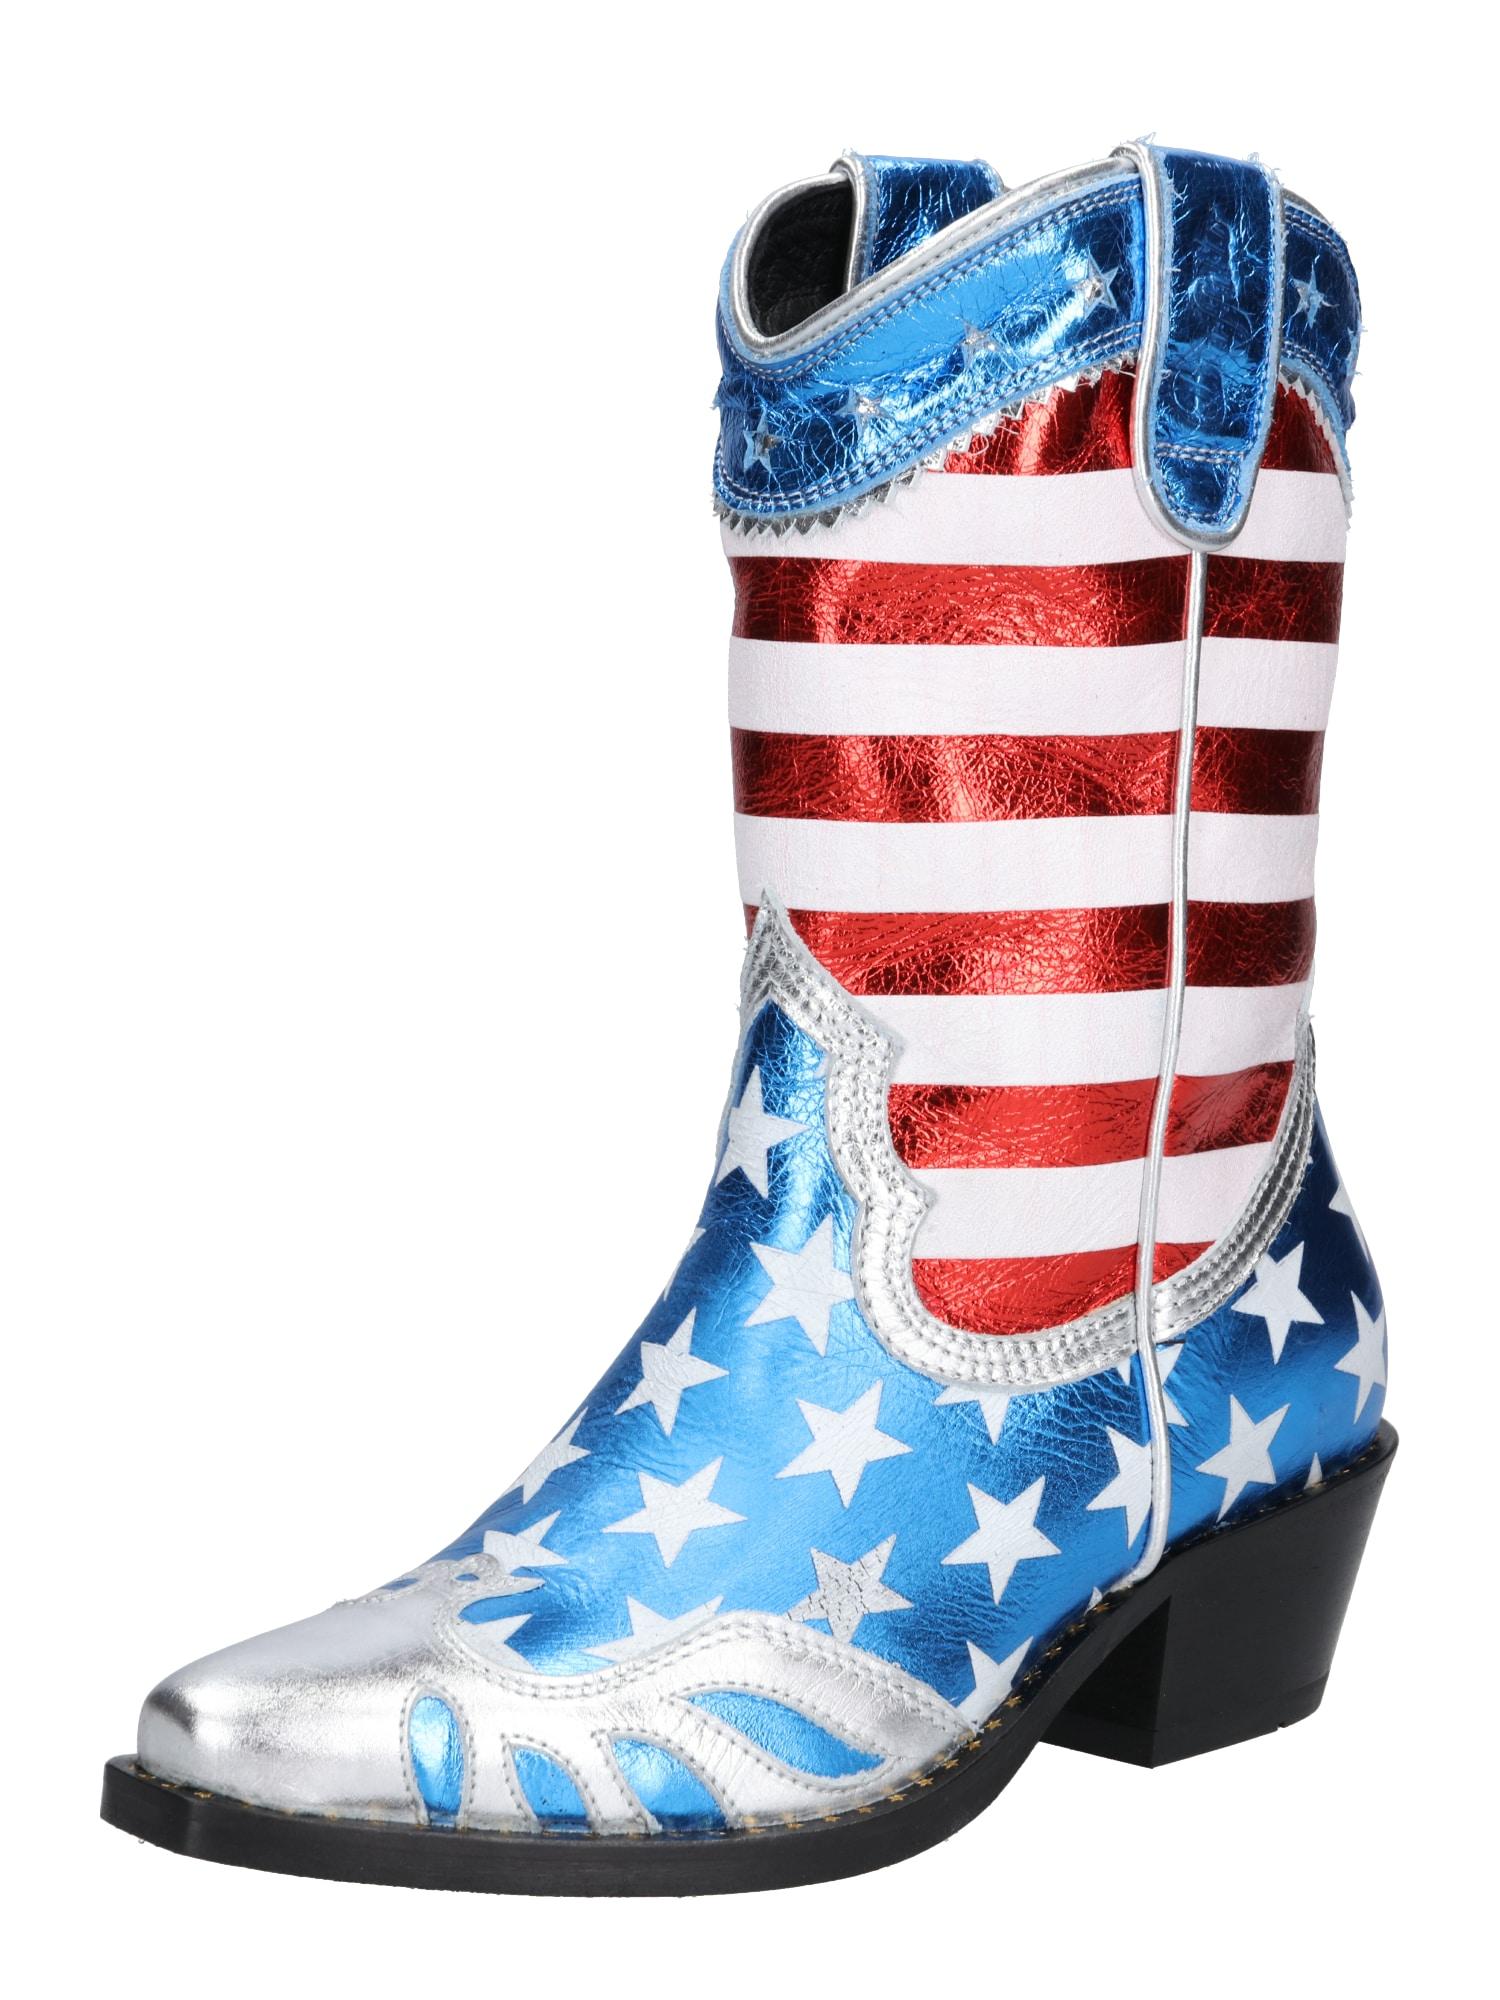 Kovbojské boty GERDA modrá červená bílá Buffalo London